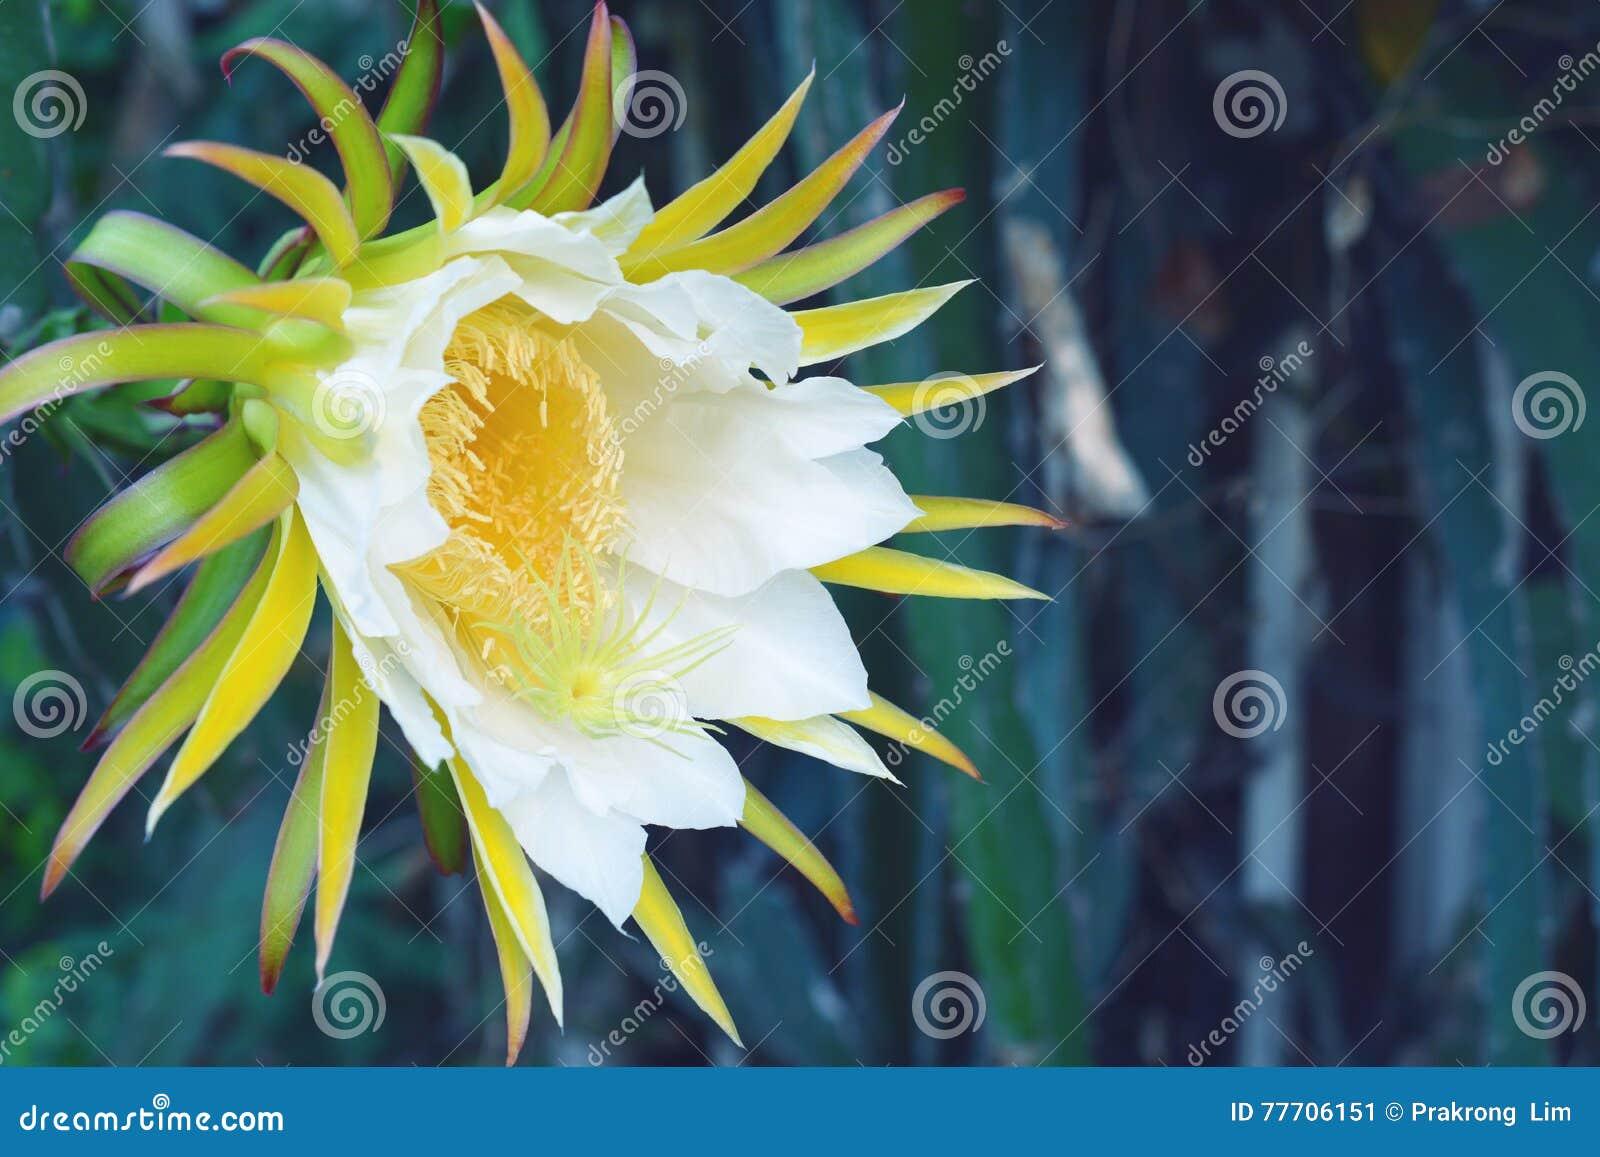 White dragon fruits flower stock image image of growing white dragon fruits flower mightylinksfo